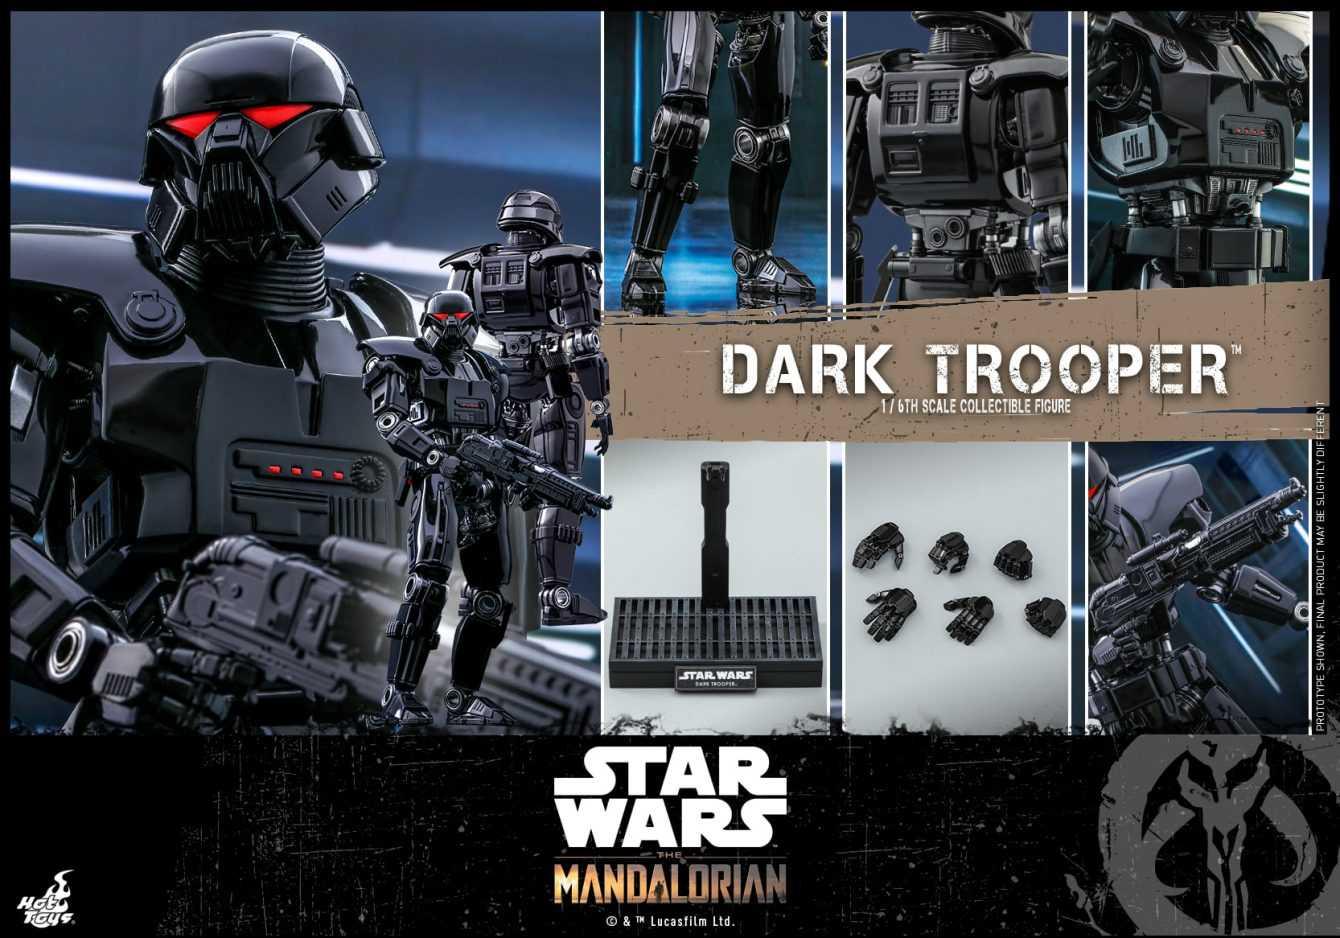 The Mandalorian: arrivano le action figure dei Dark Trooper